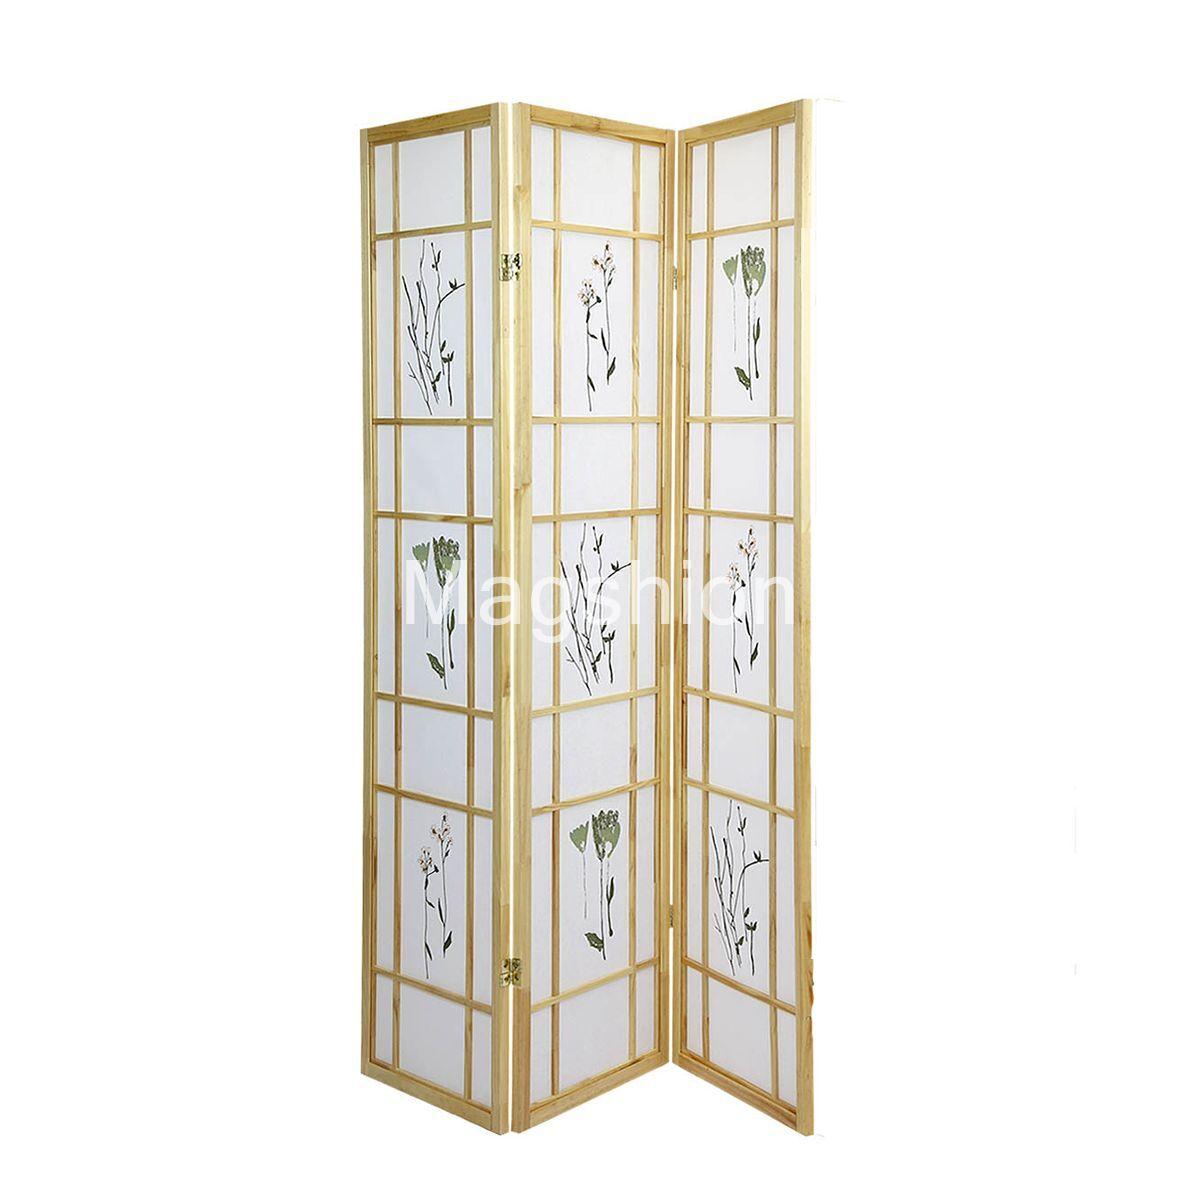 Http Www Ebay Com Itm 3 4 Panel Japanese Oriental Room Divider Hardwood Shoji Screen Privacy Wall 331594286878